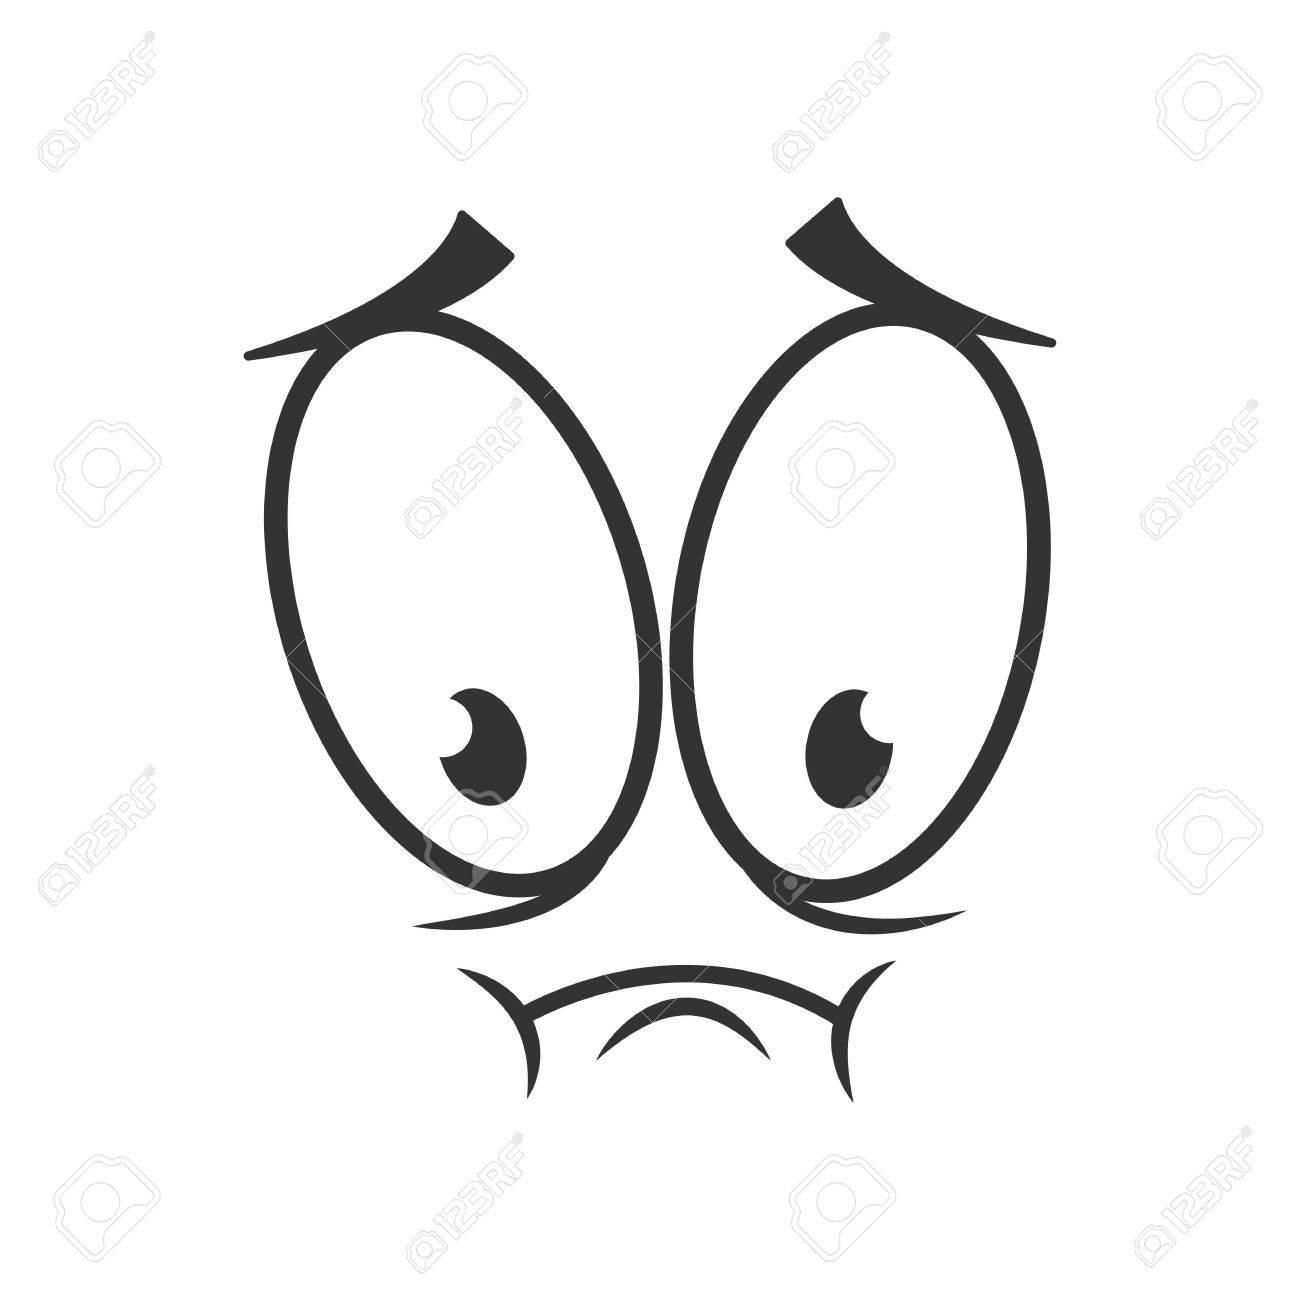 depressed emotion icon design